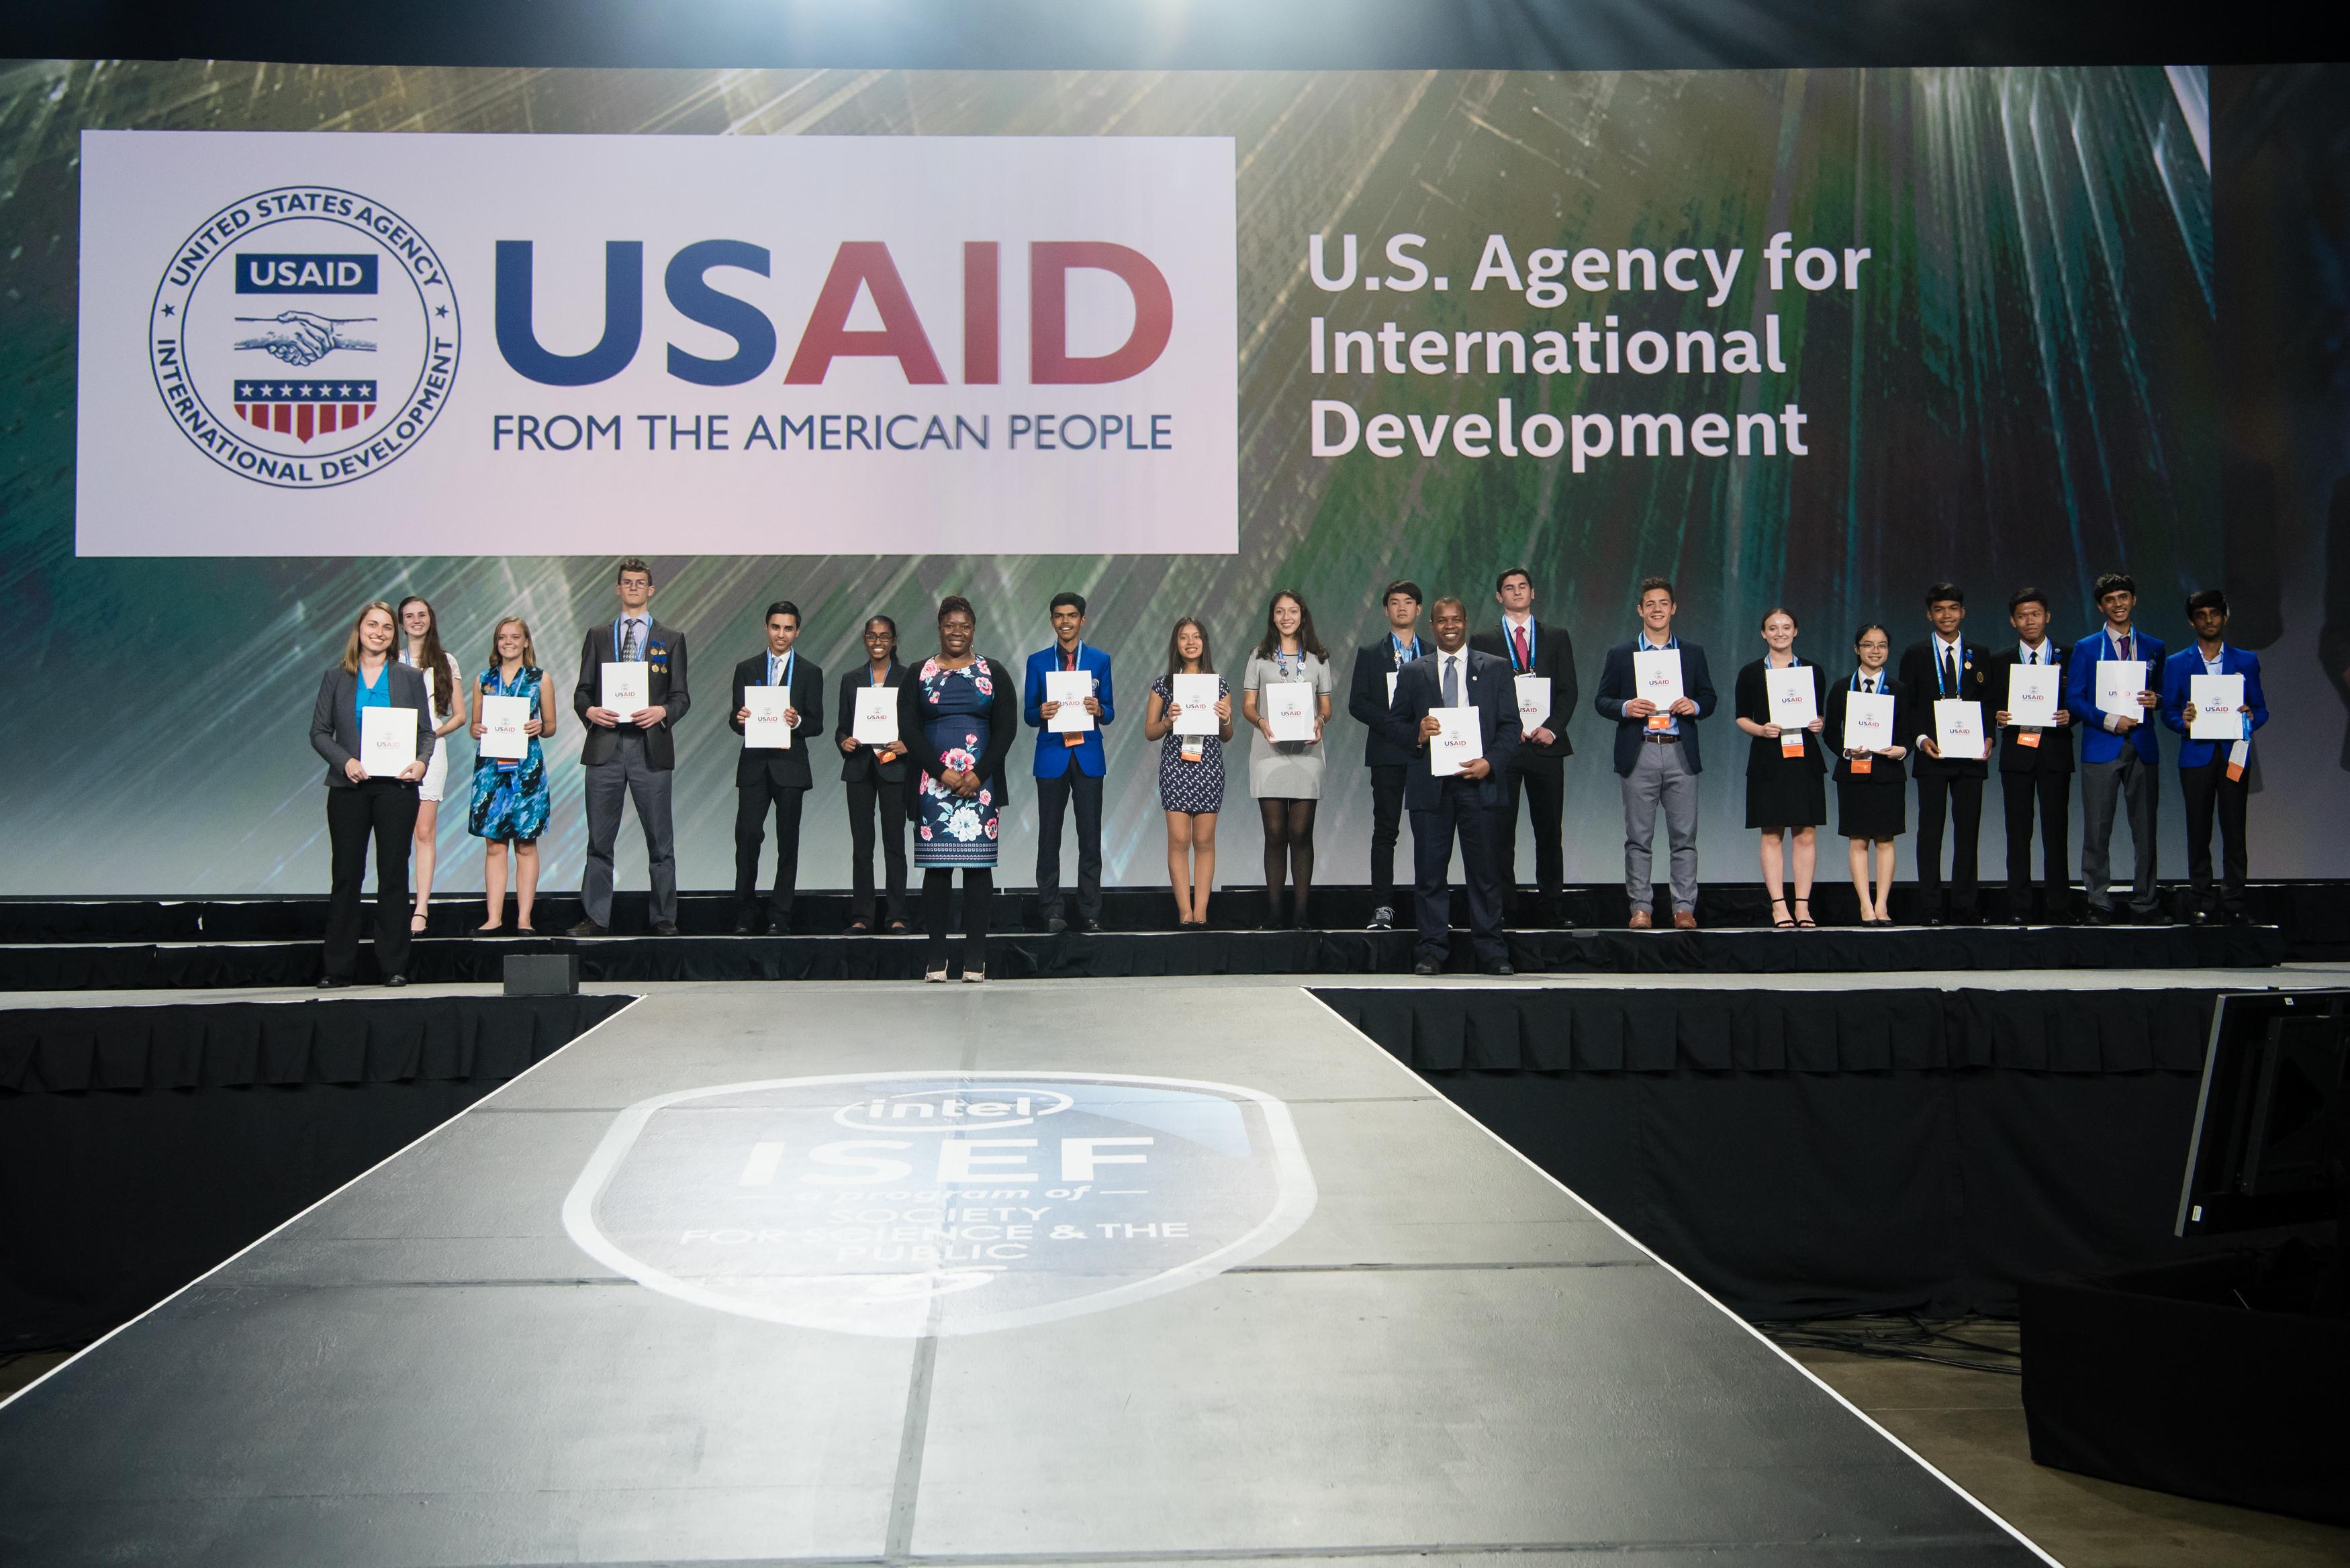 U.S. Agency for International Development  b1b1d413c13a